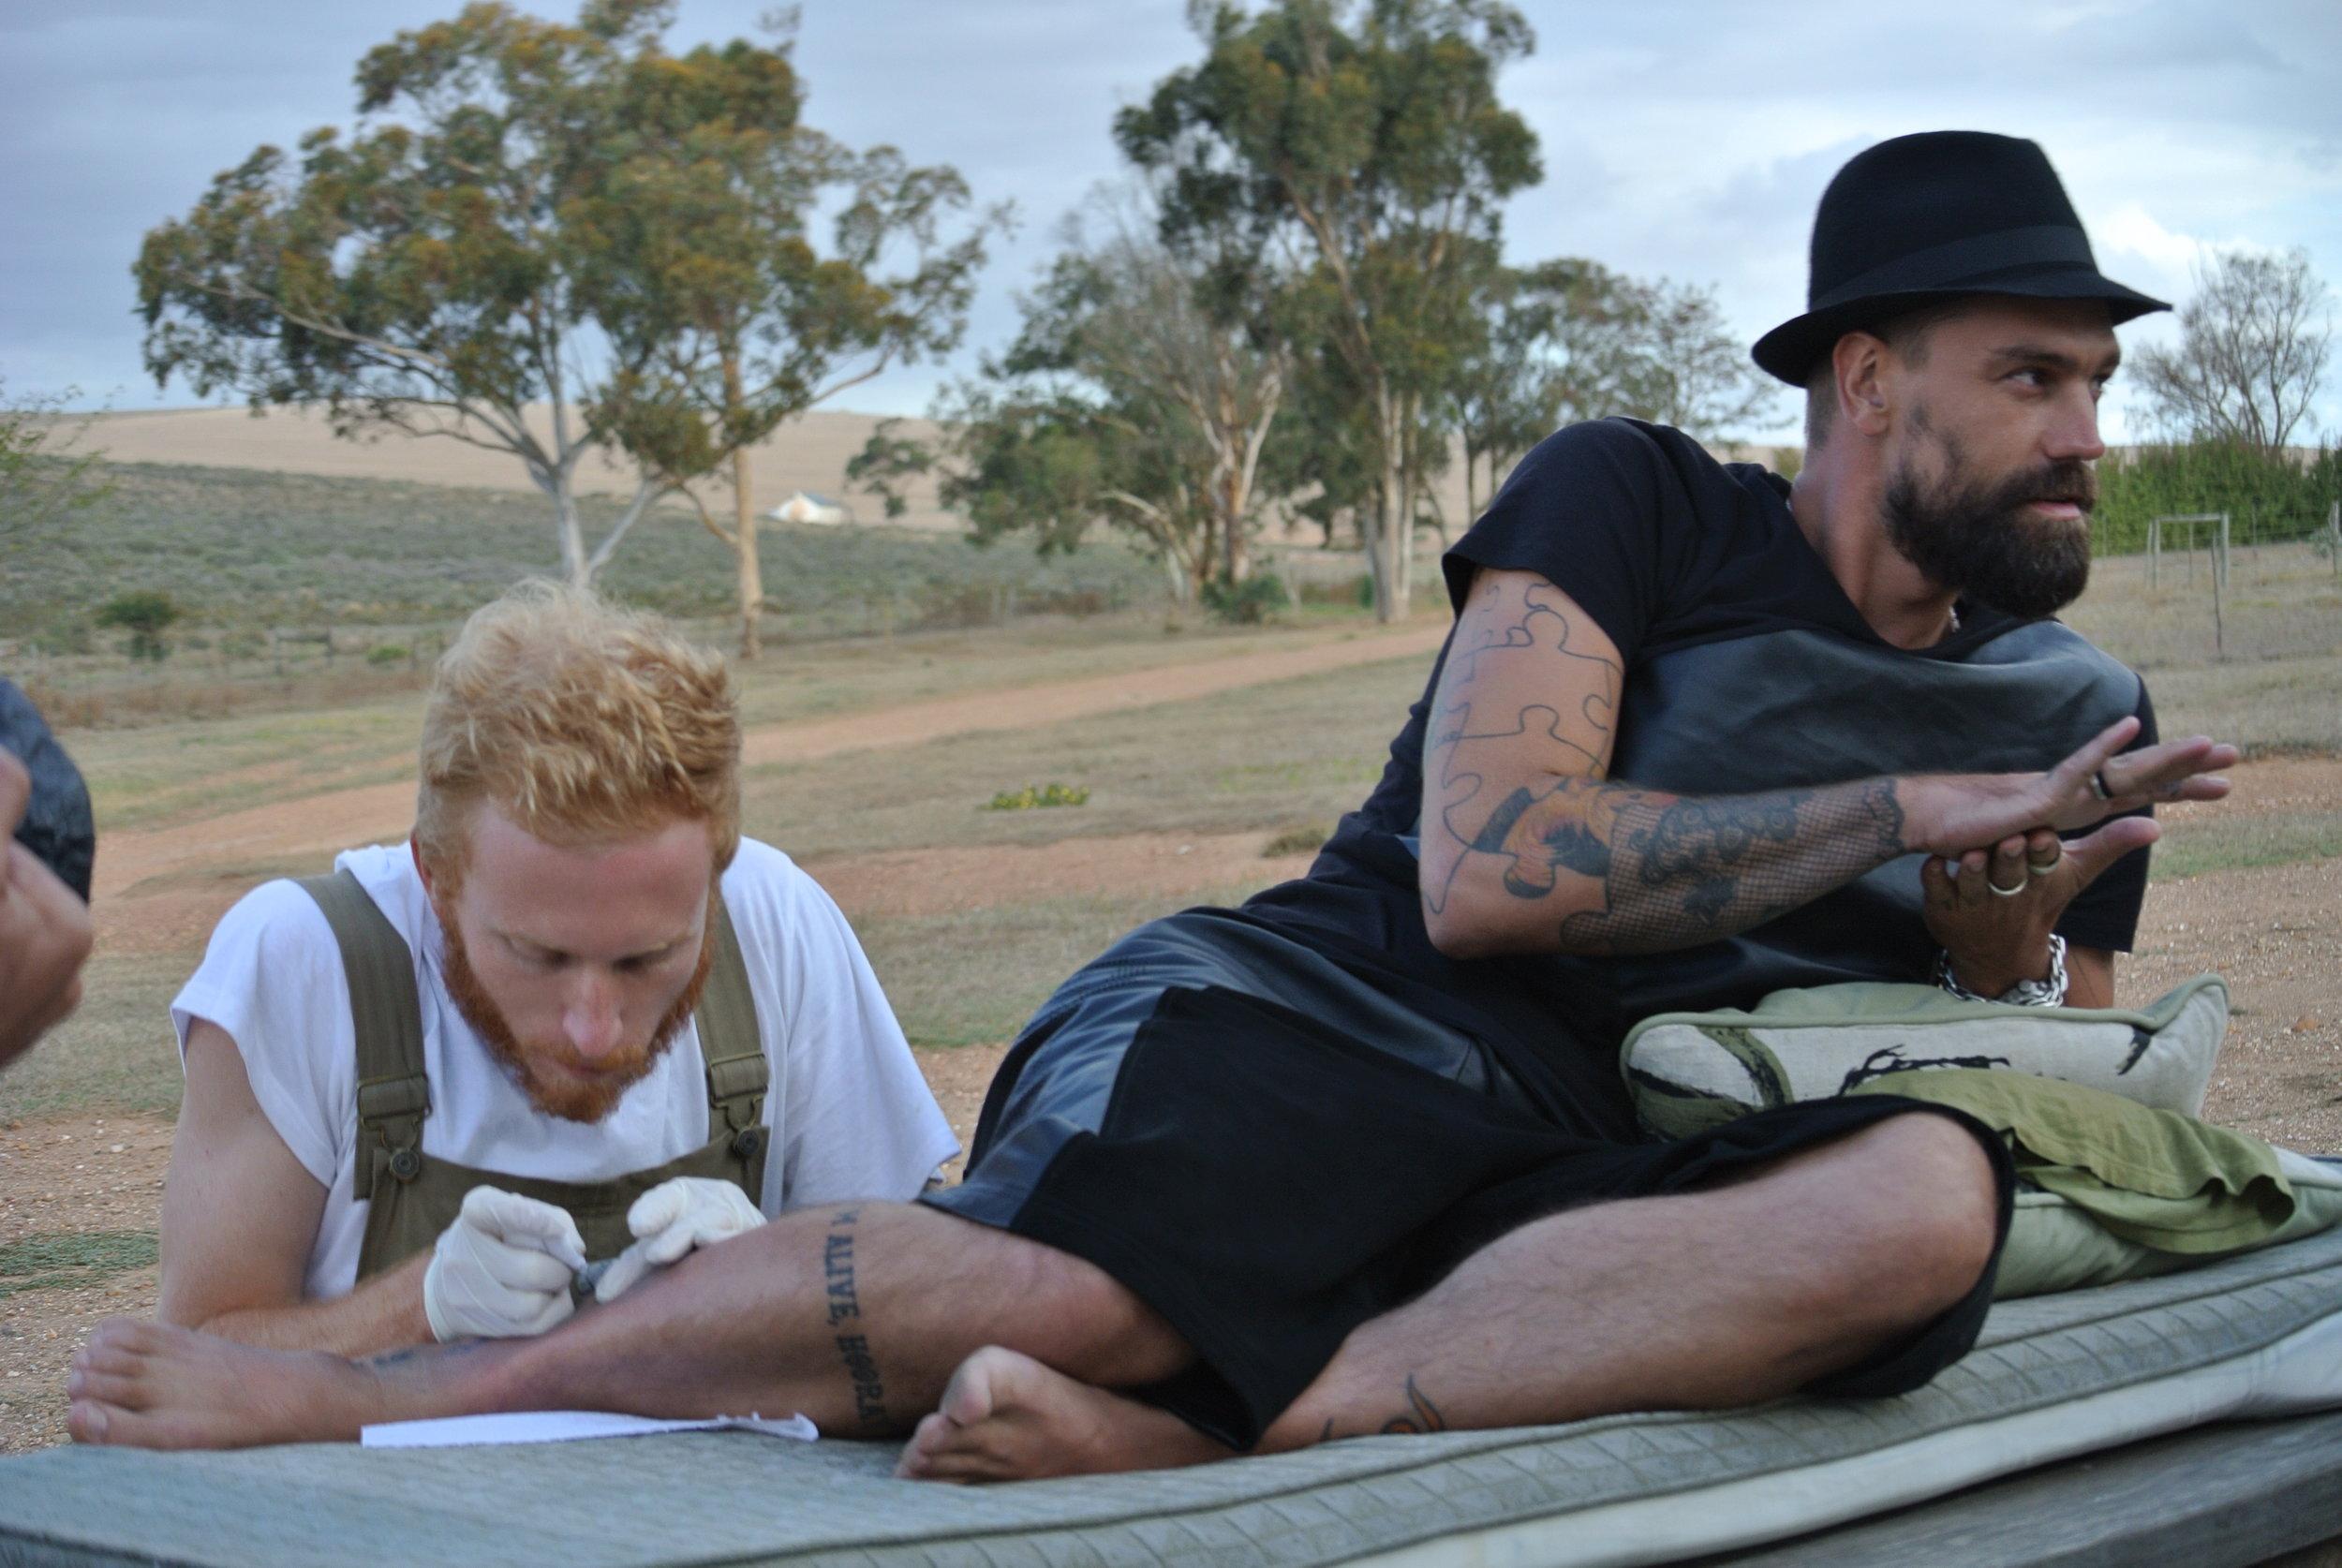 Brett getting tattooed by NinjaBreadBoy.JPG